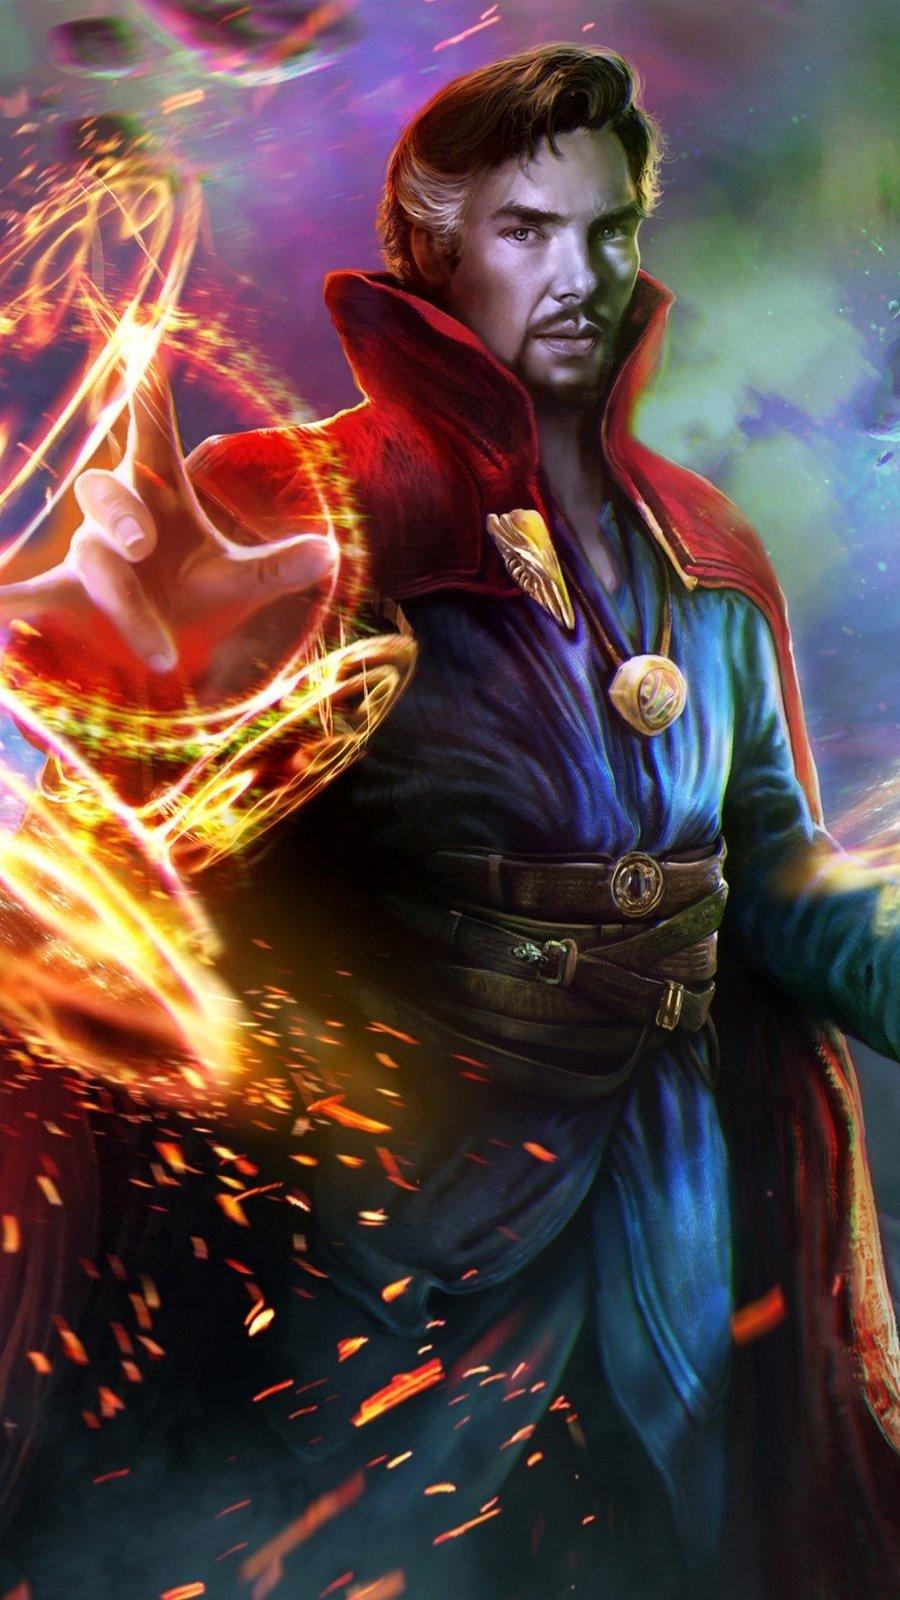 Fondos de pantalla Fan art de Doctor Strange Vertical